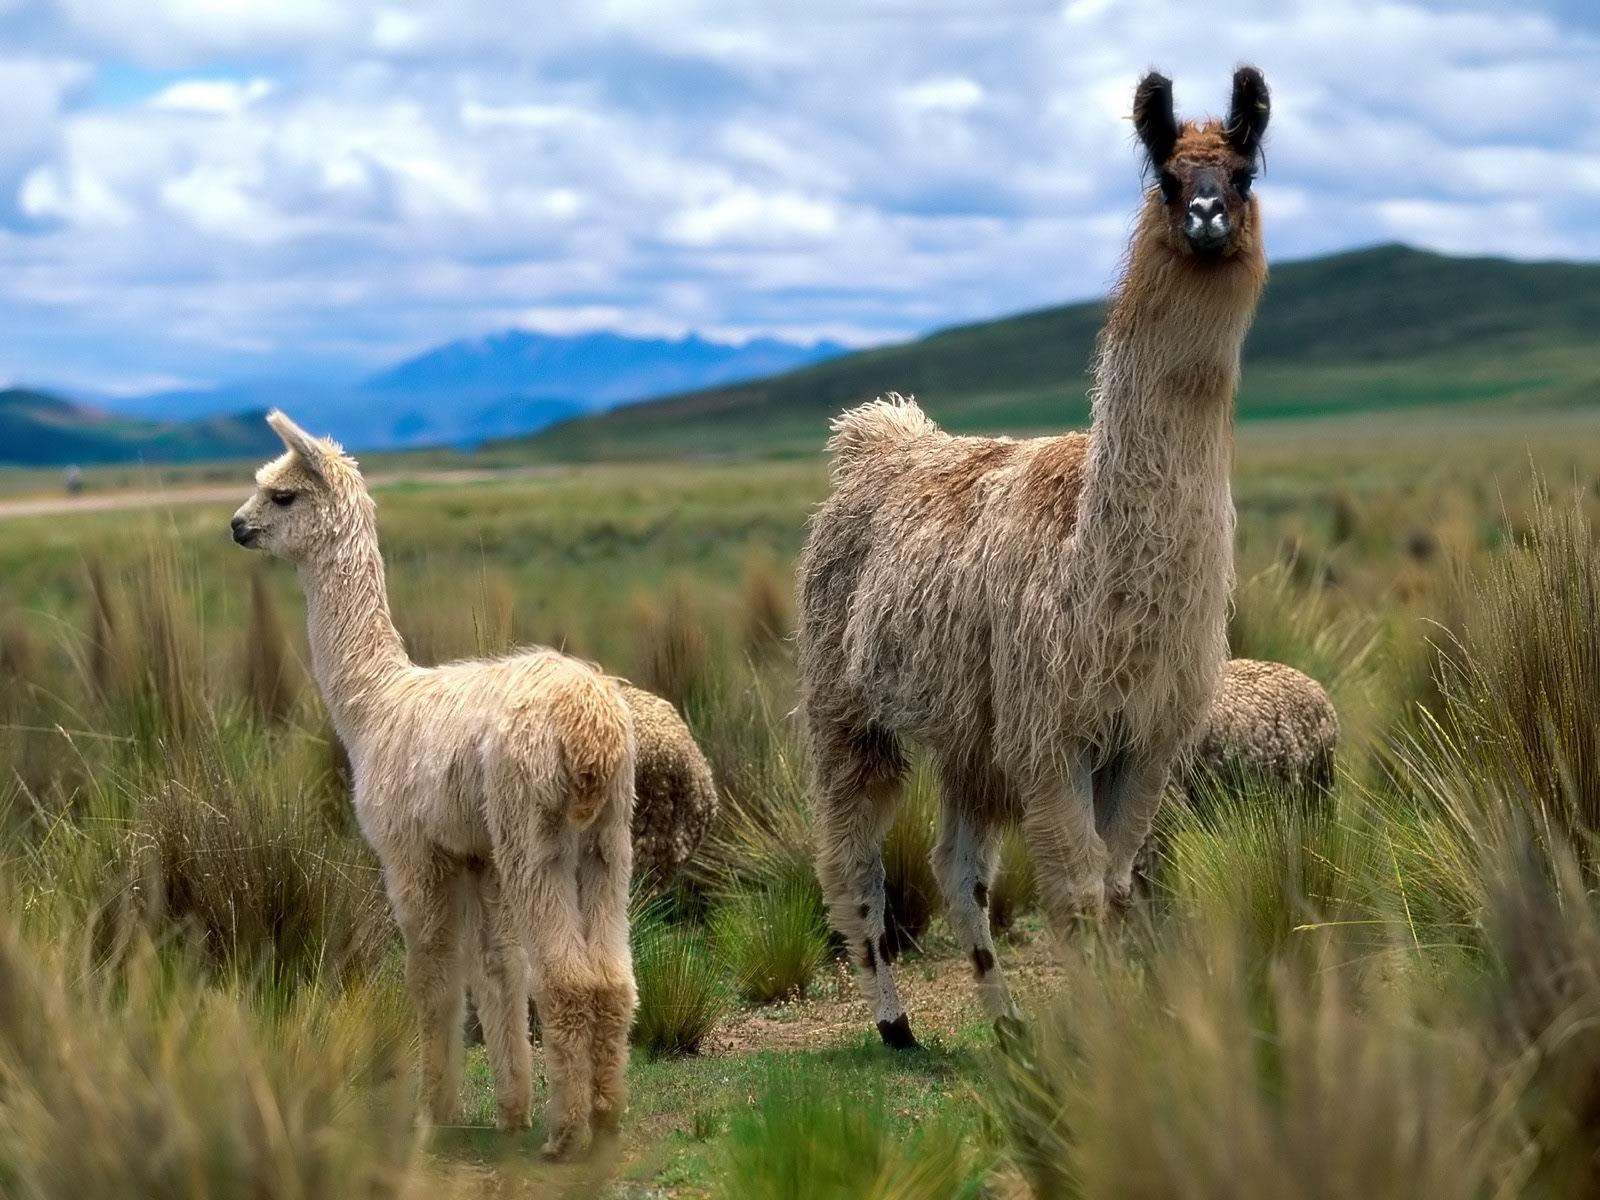 Alpacas and Llamas images Llama wallpapers HD wallpaper 1600x1200